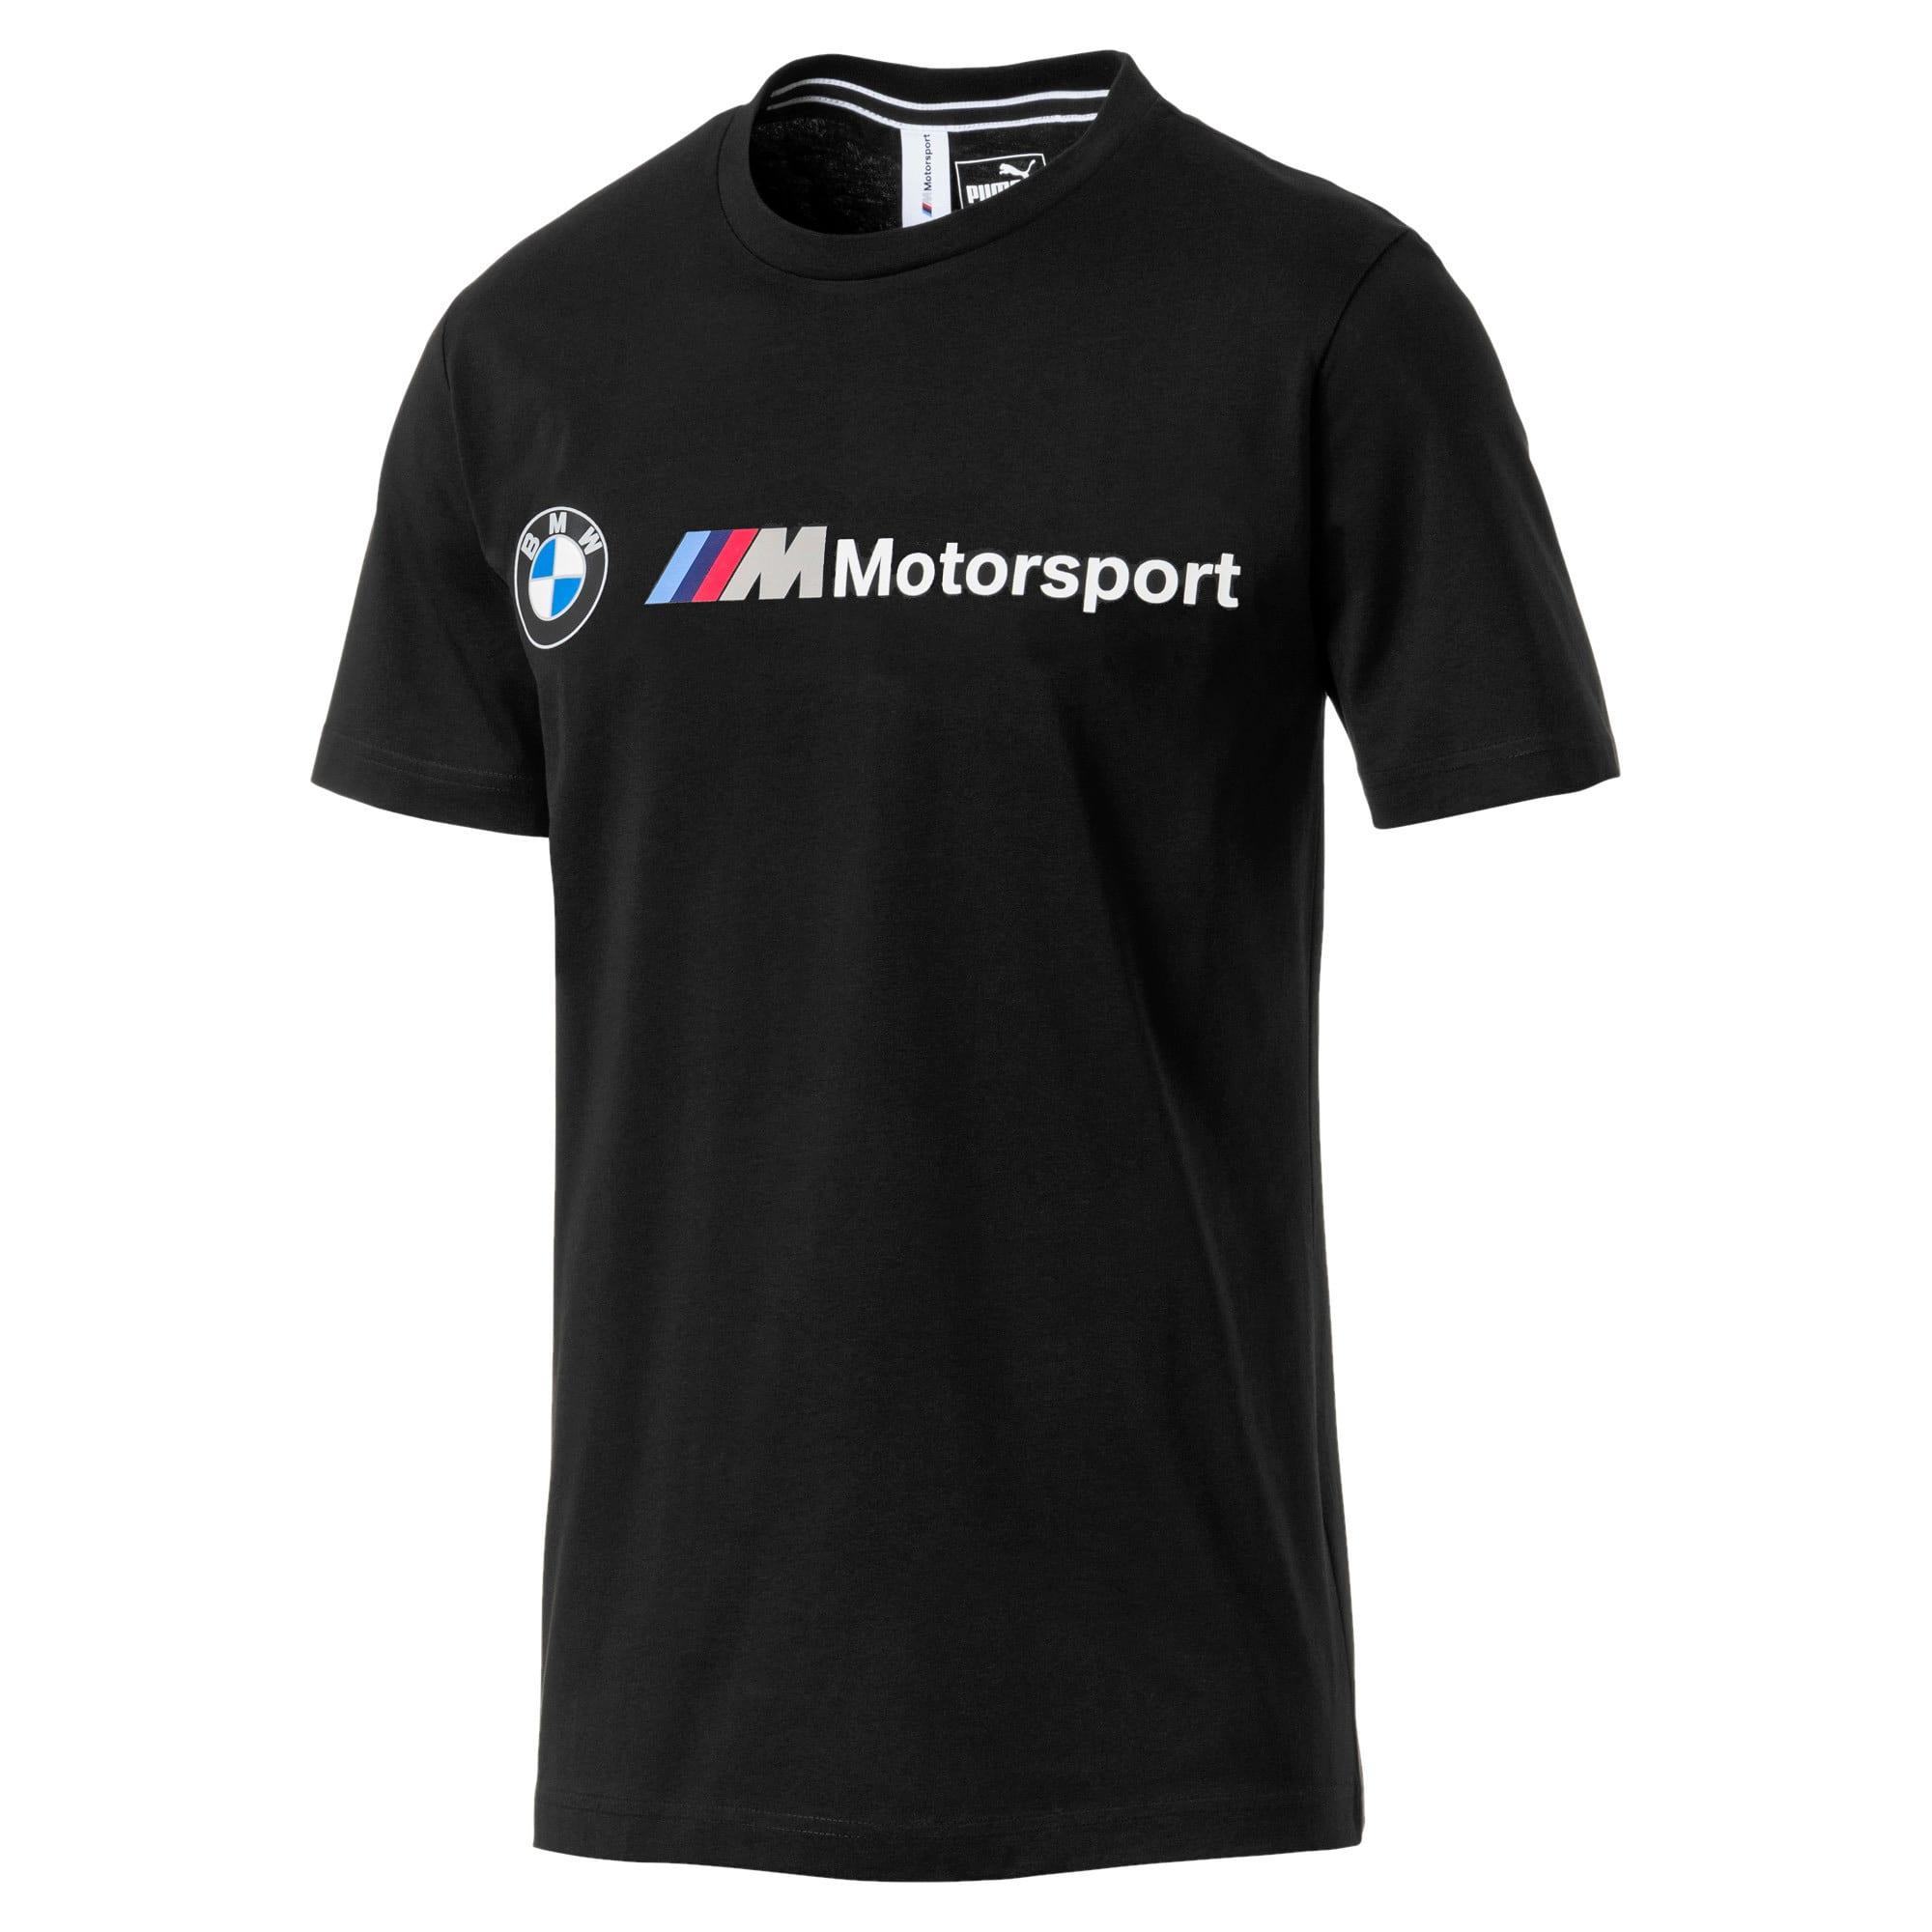 Thumbnail 4 of BMW M Motorsport Logo Men's Tee, Puma Black, medium